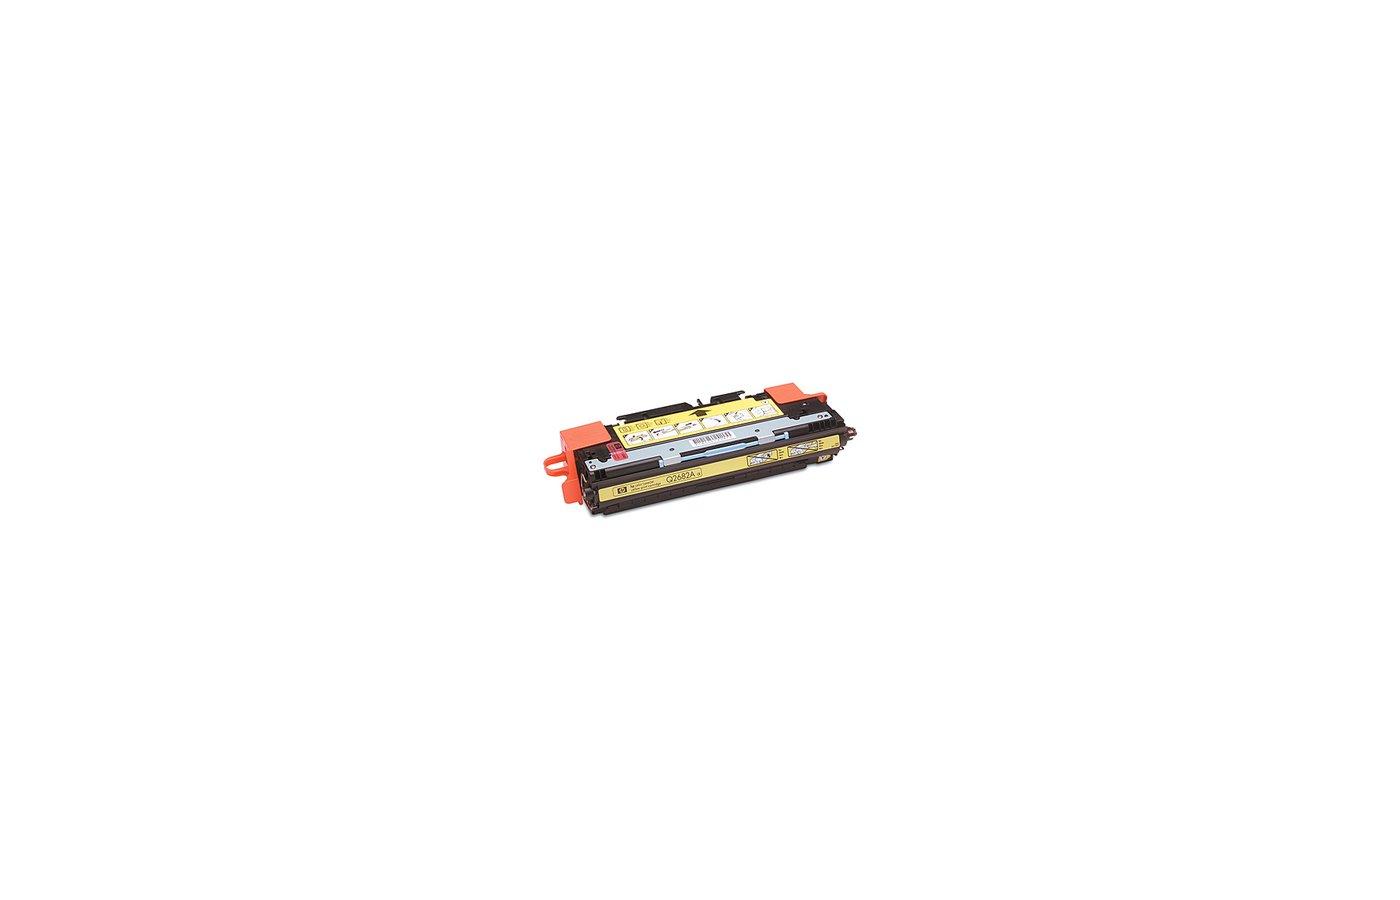 Картридж лазерный HP Q2682A yellow for Color LaserJet 3700